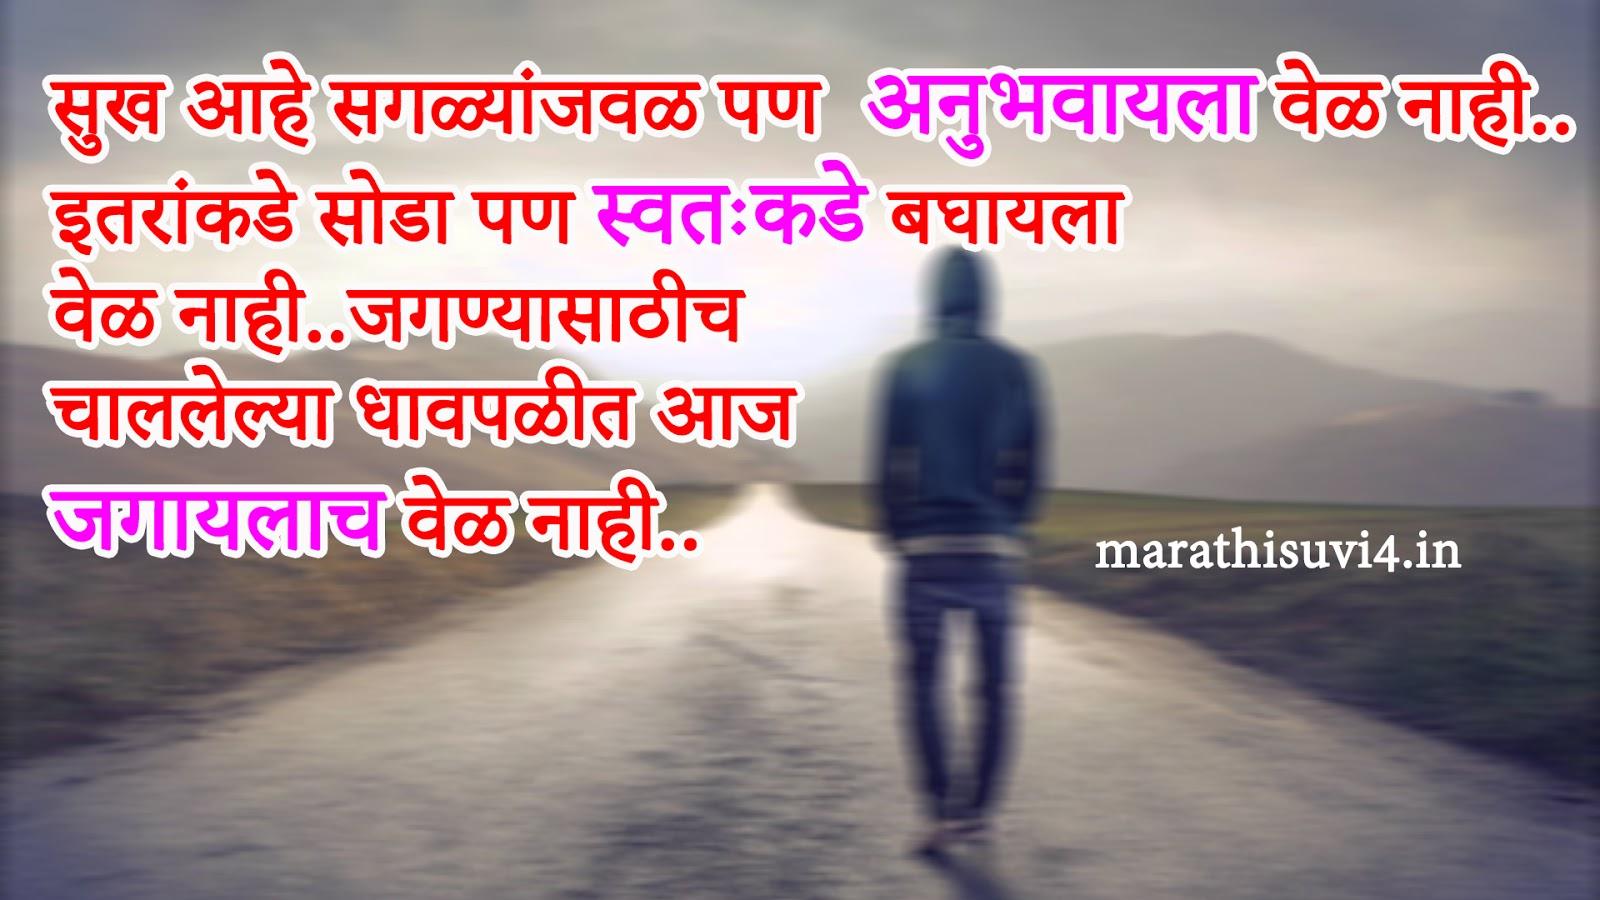 Life fact truth of life quotes in Marathi - Marathi Suvichar for Happy Life Status In Marathi  157uhy